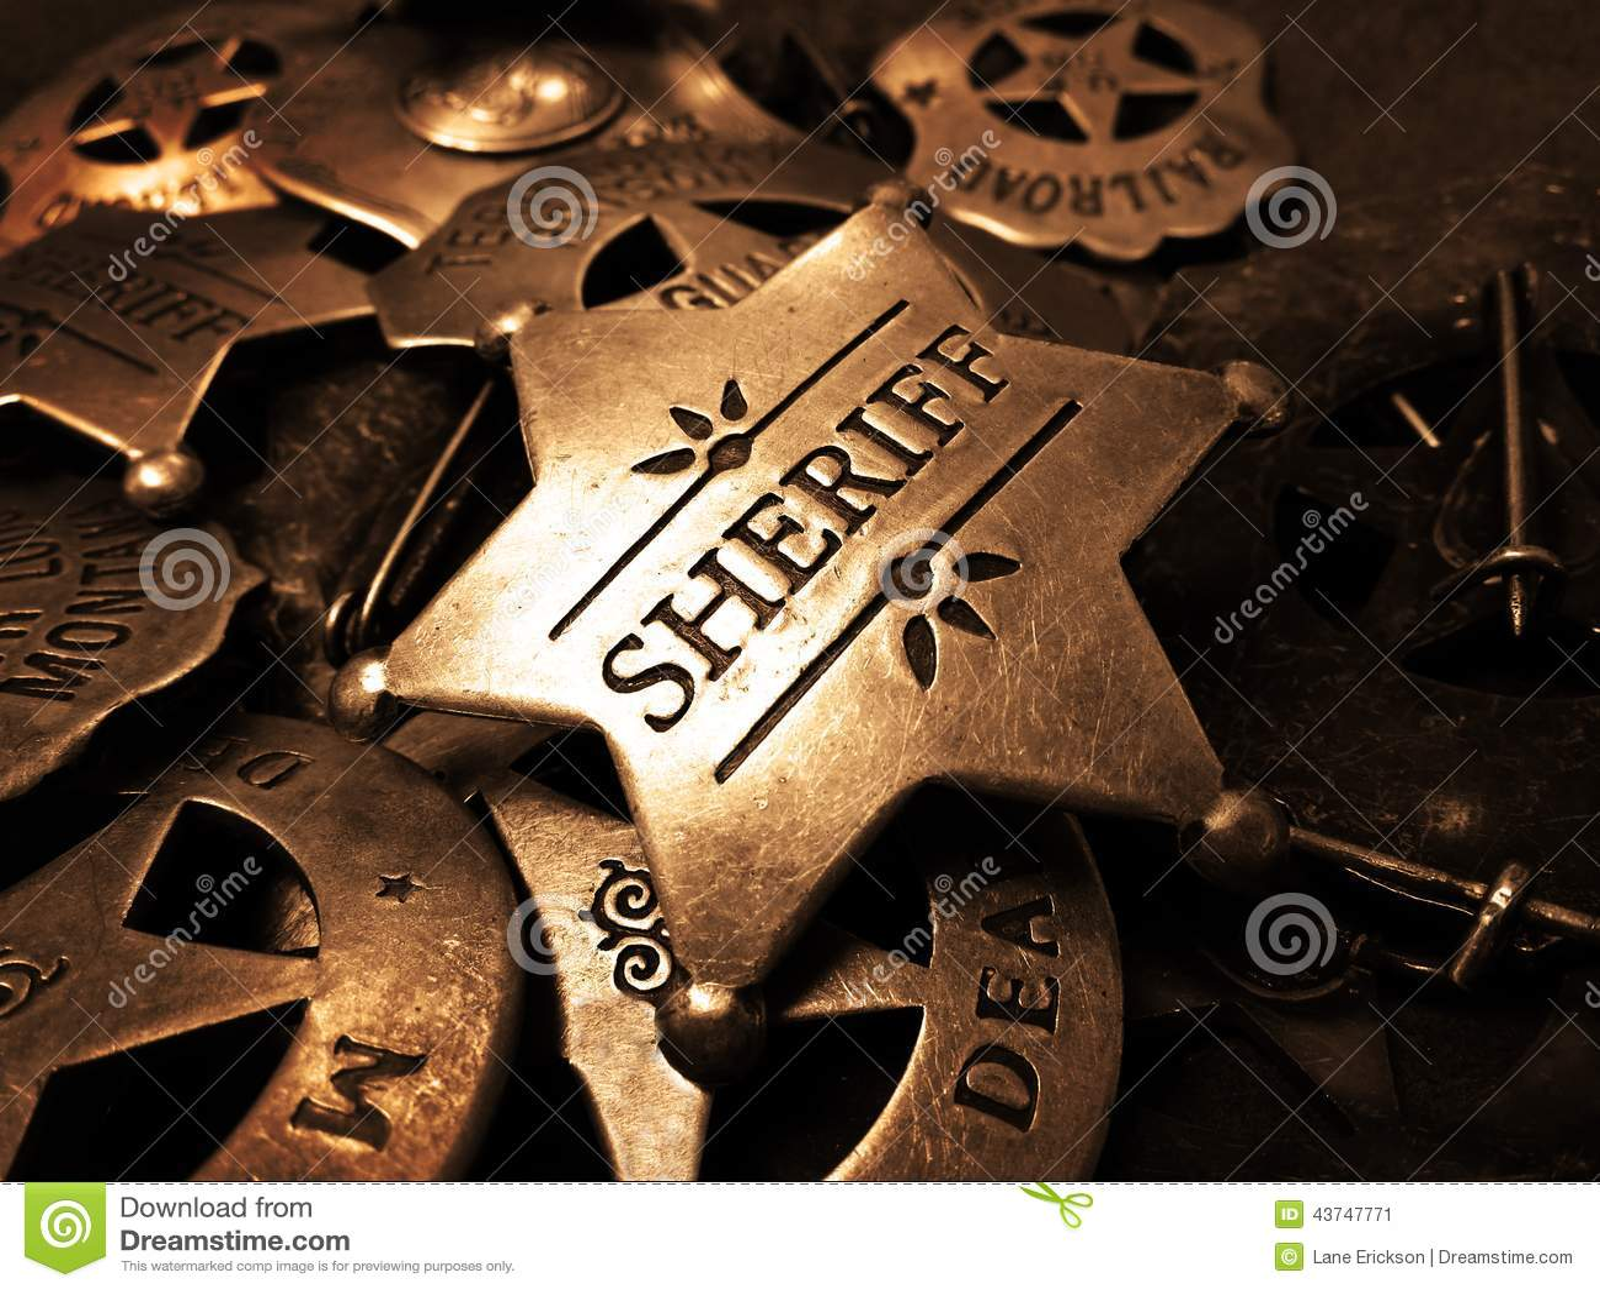 Der Ausweis Tin Star Law Enforcement des Sheriffs